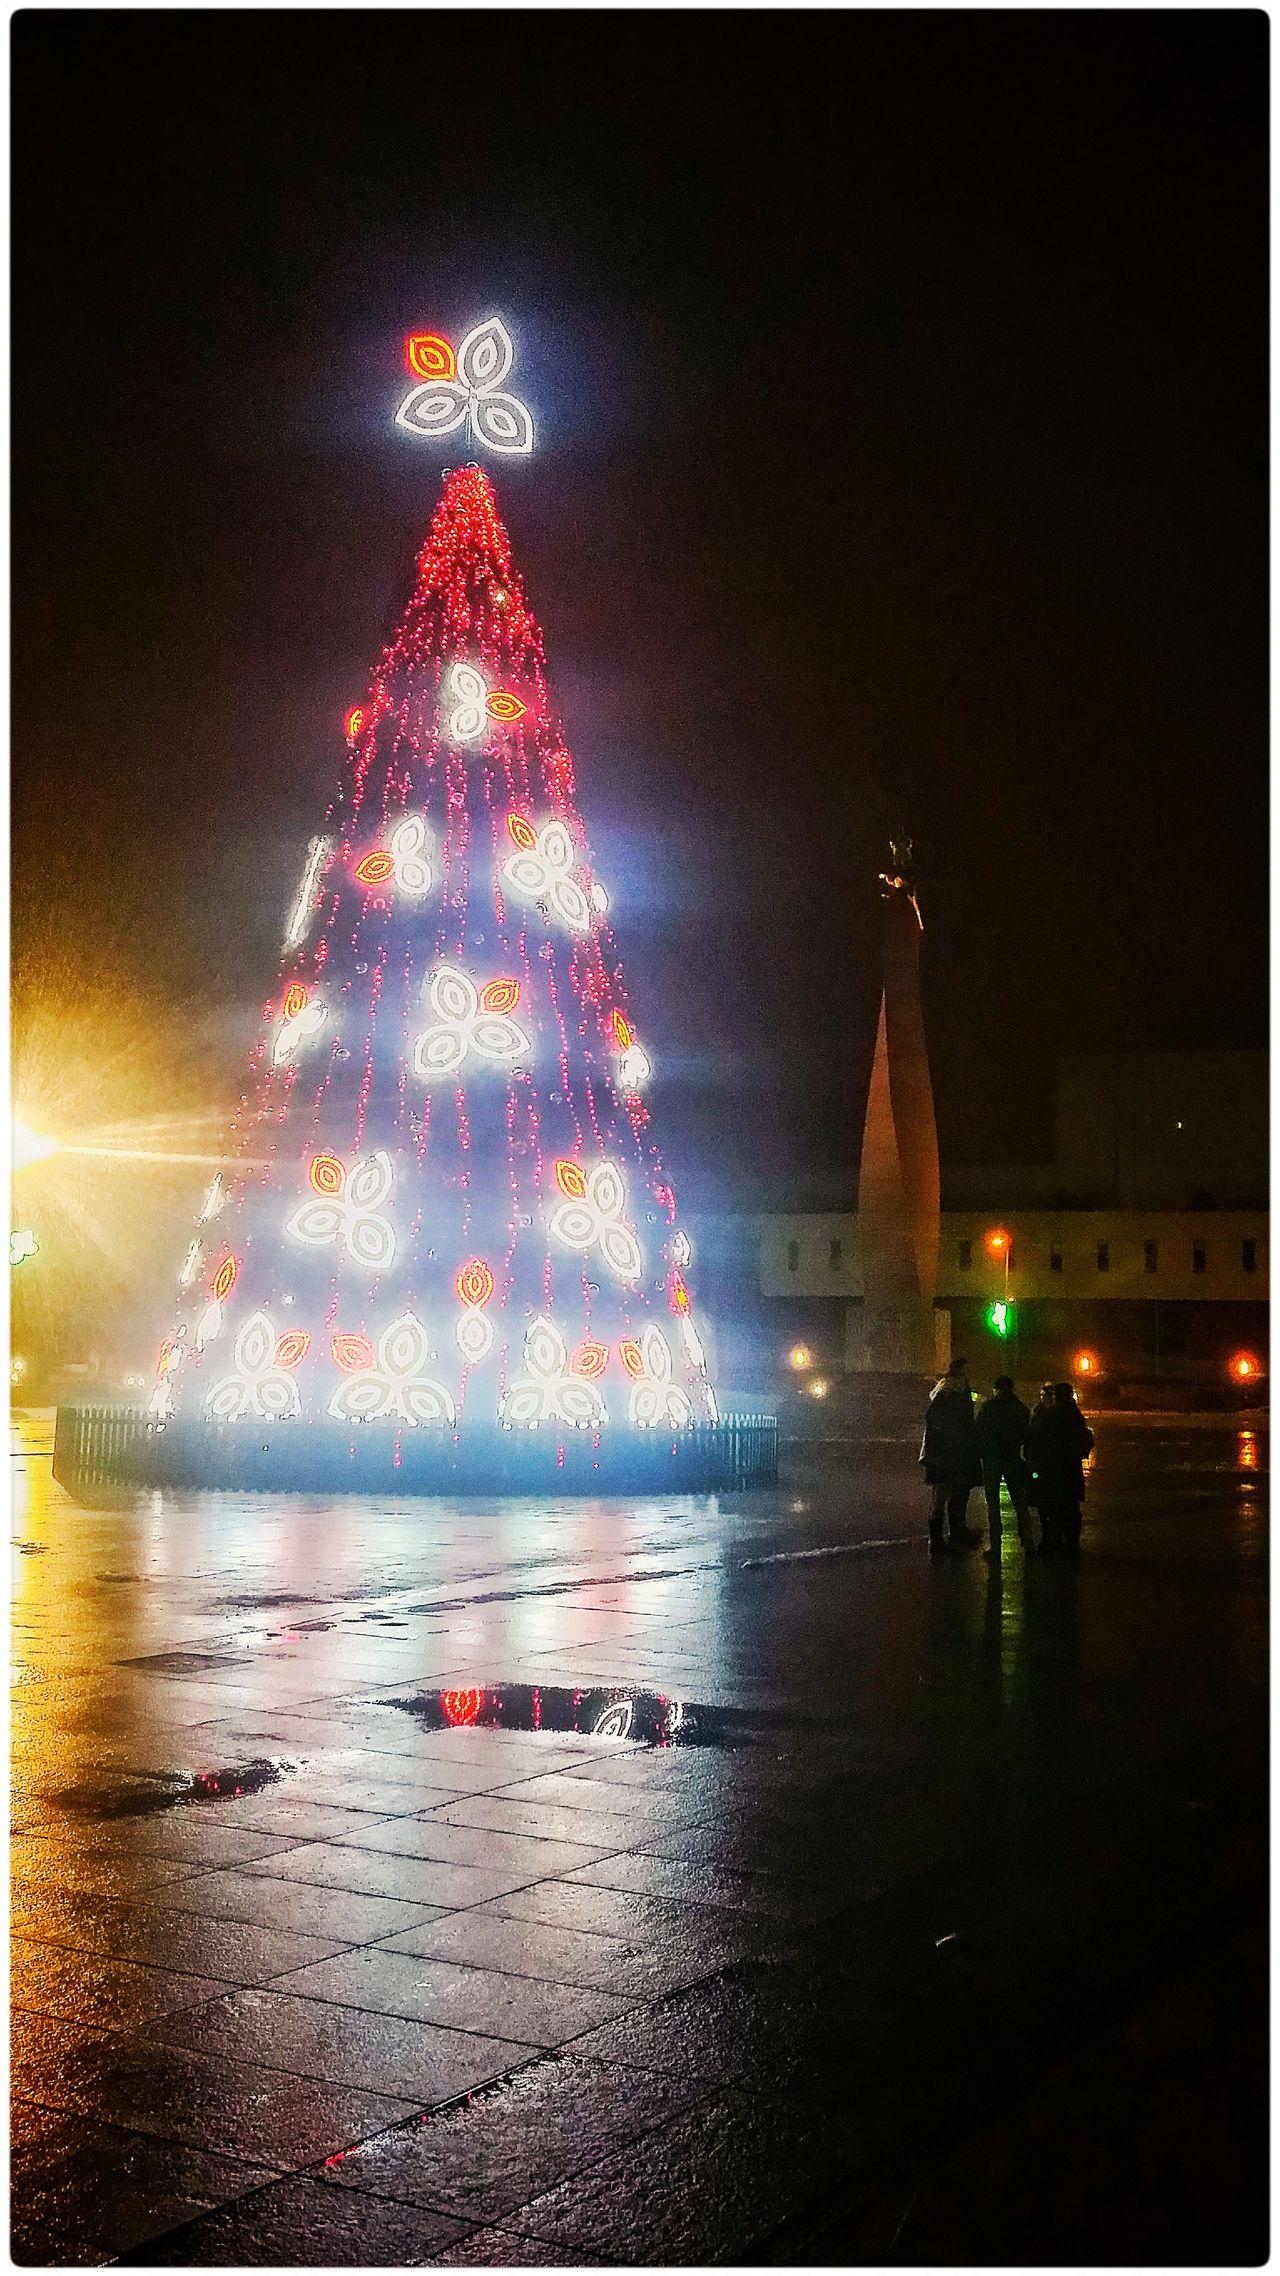 Illuminated Night Christmas Christmas Tree Outdoors No People City Celebration Cityscape Travel Destinations